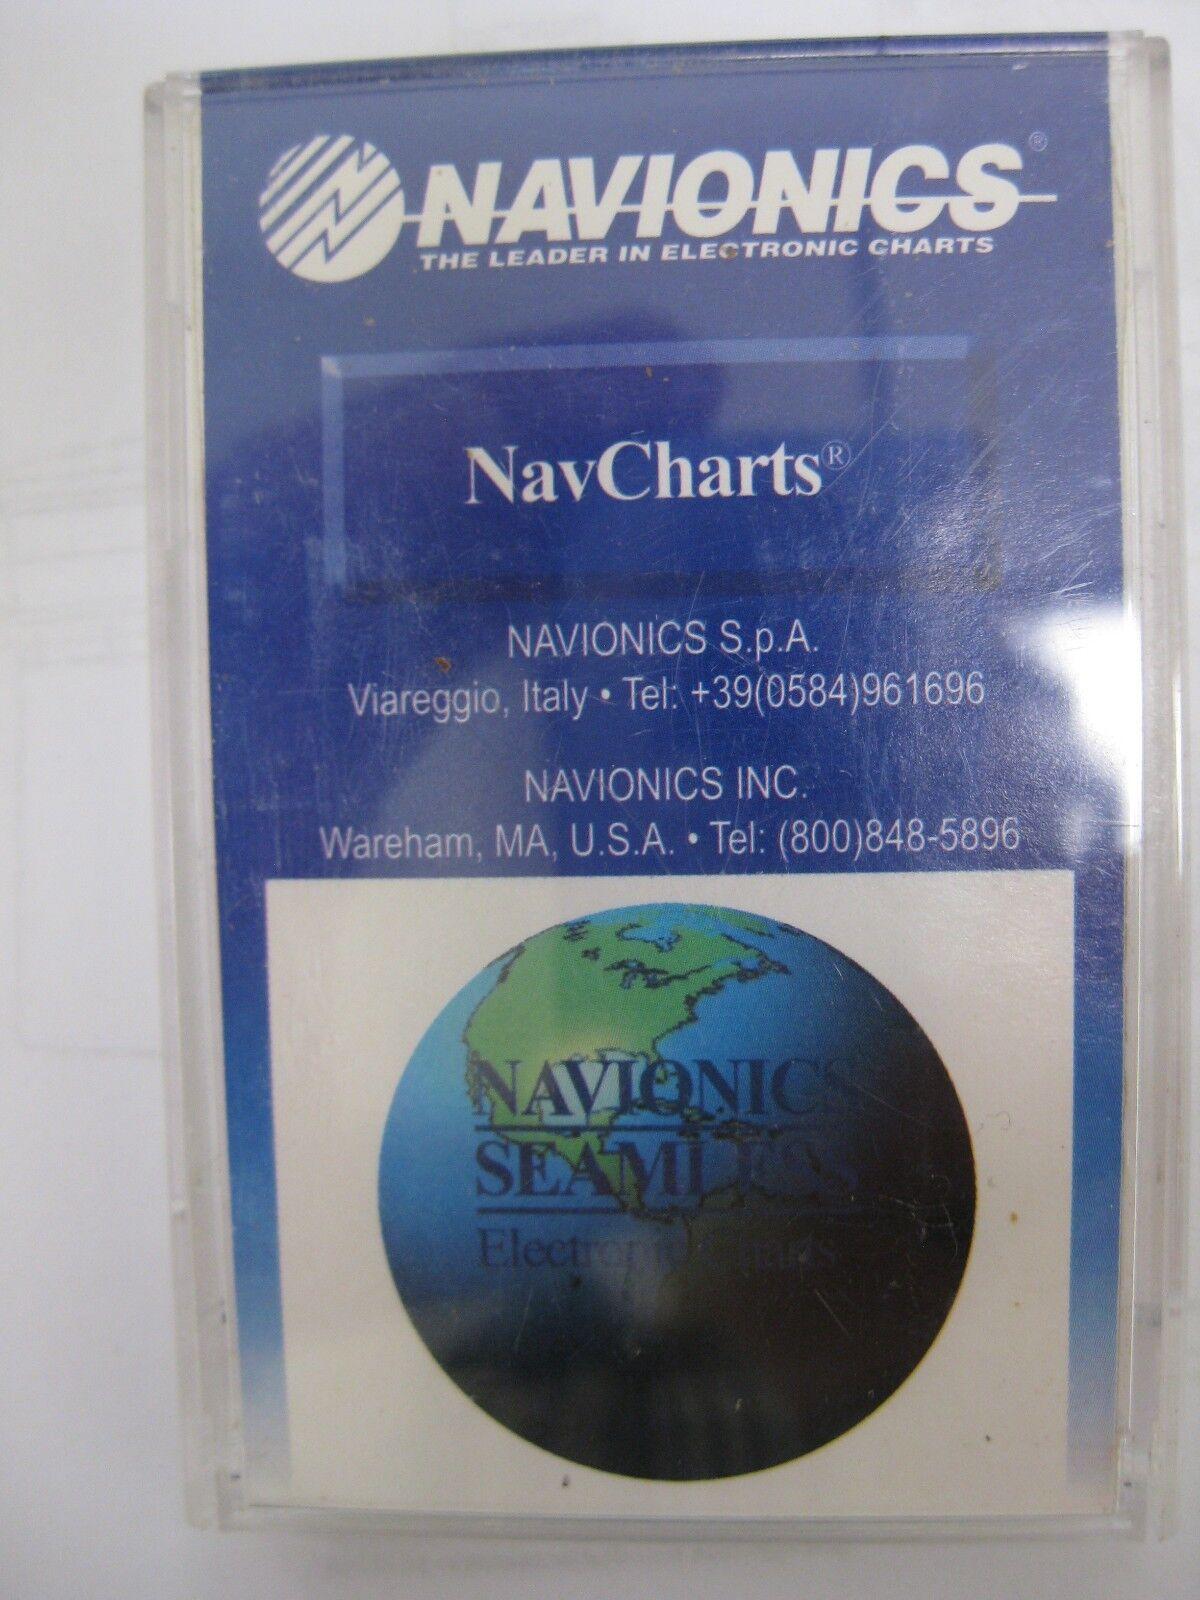 NAVIONICS ELECTRONIC CHART - Mideast Florida NavChart US029D16